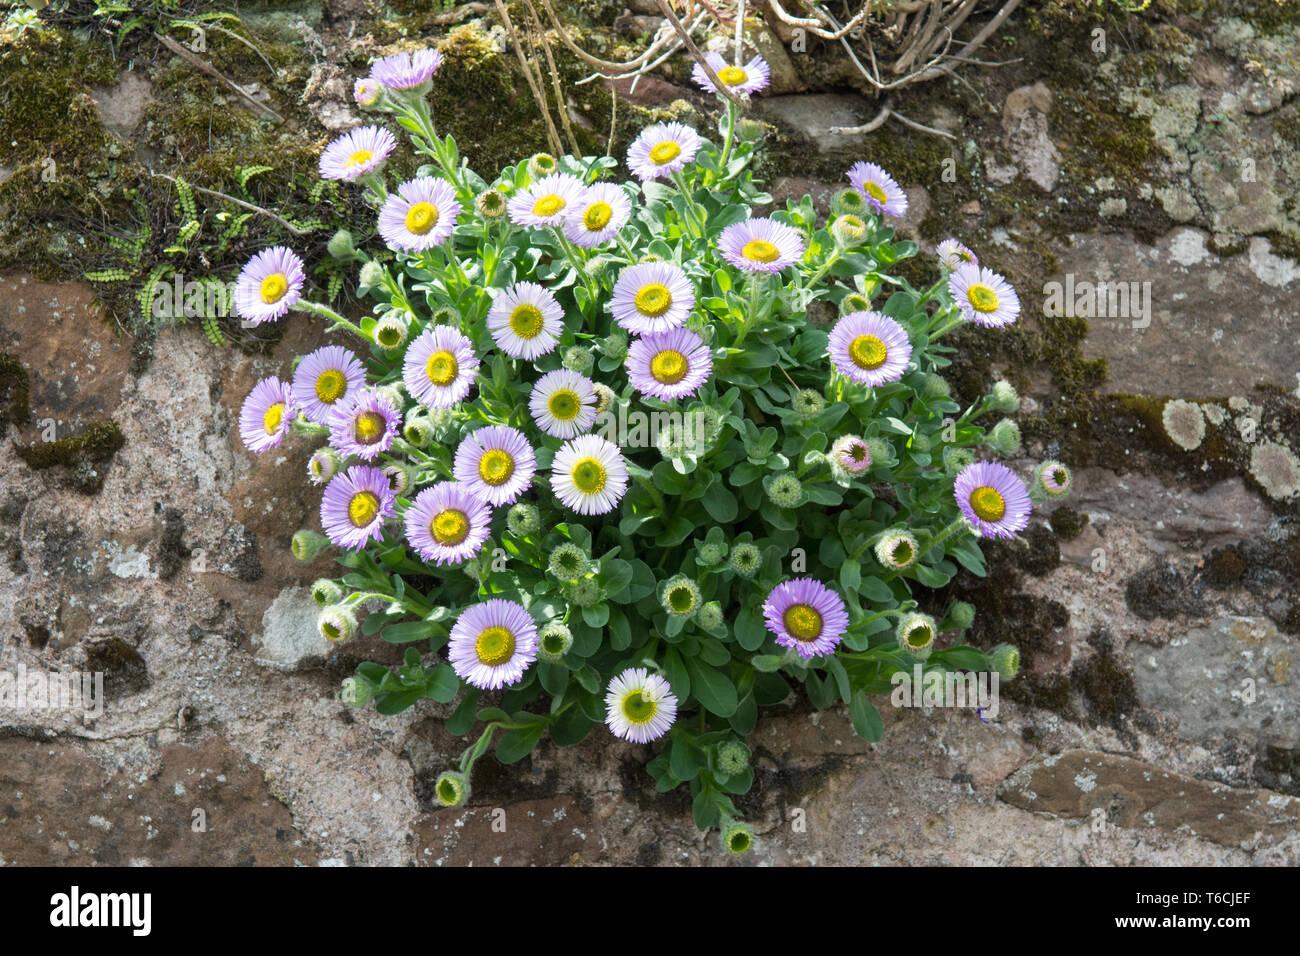 Erigeron Glaucus o seaside fleabane daisy o planta que crecen en una pared - UK Foto de stock